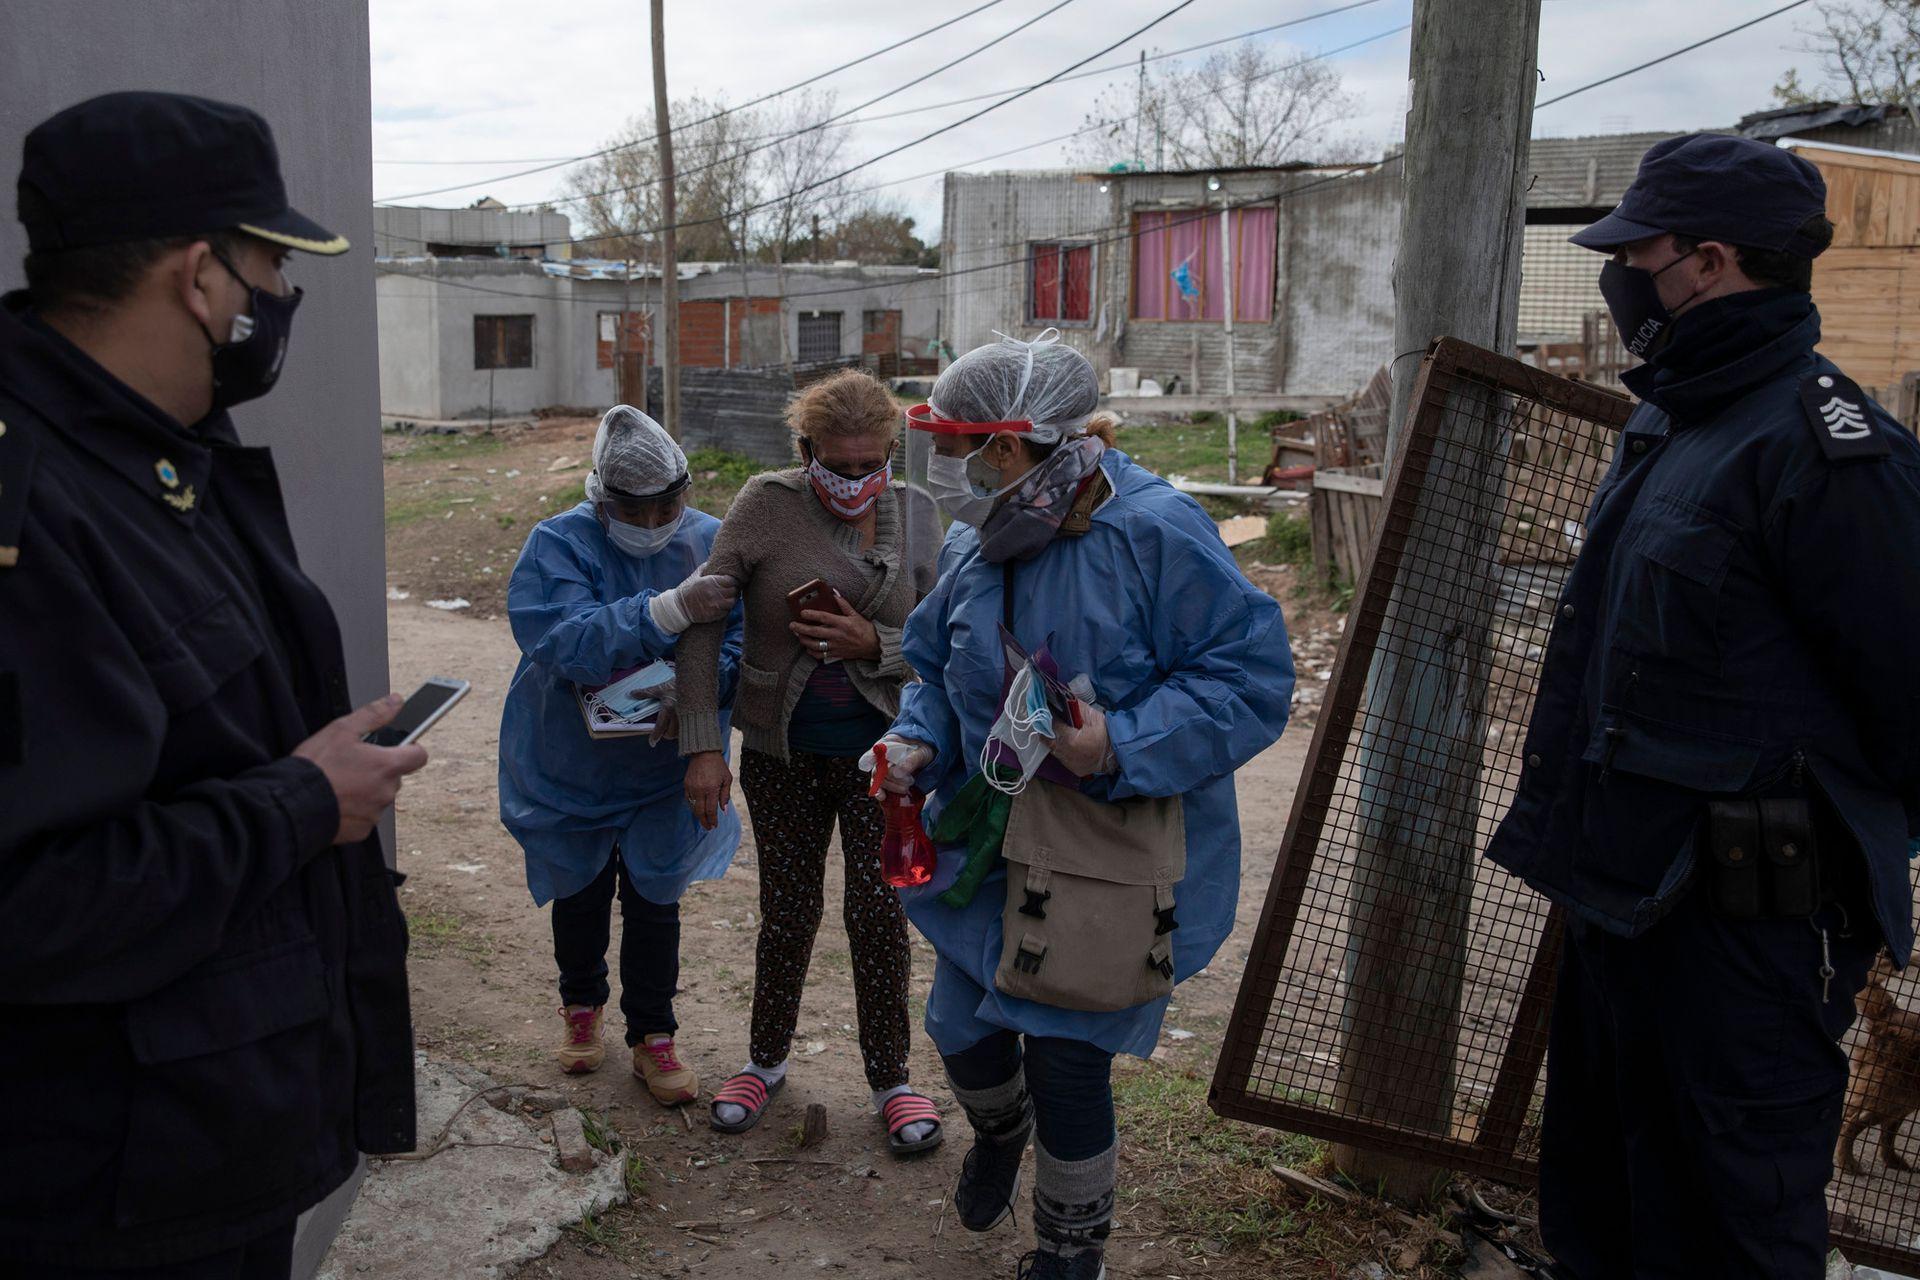 Coronavirus en barrios vulnerables, imagen de la Villa Azul